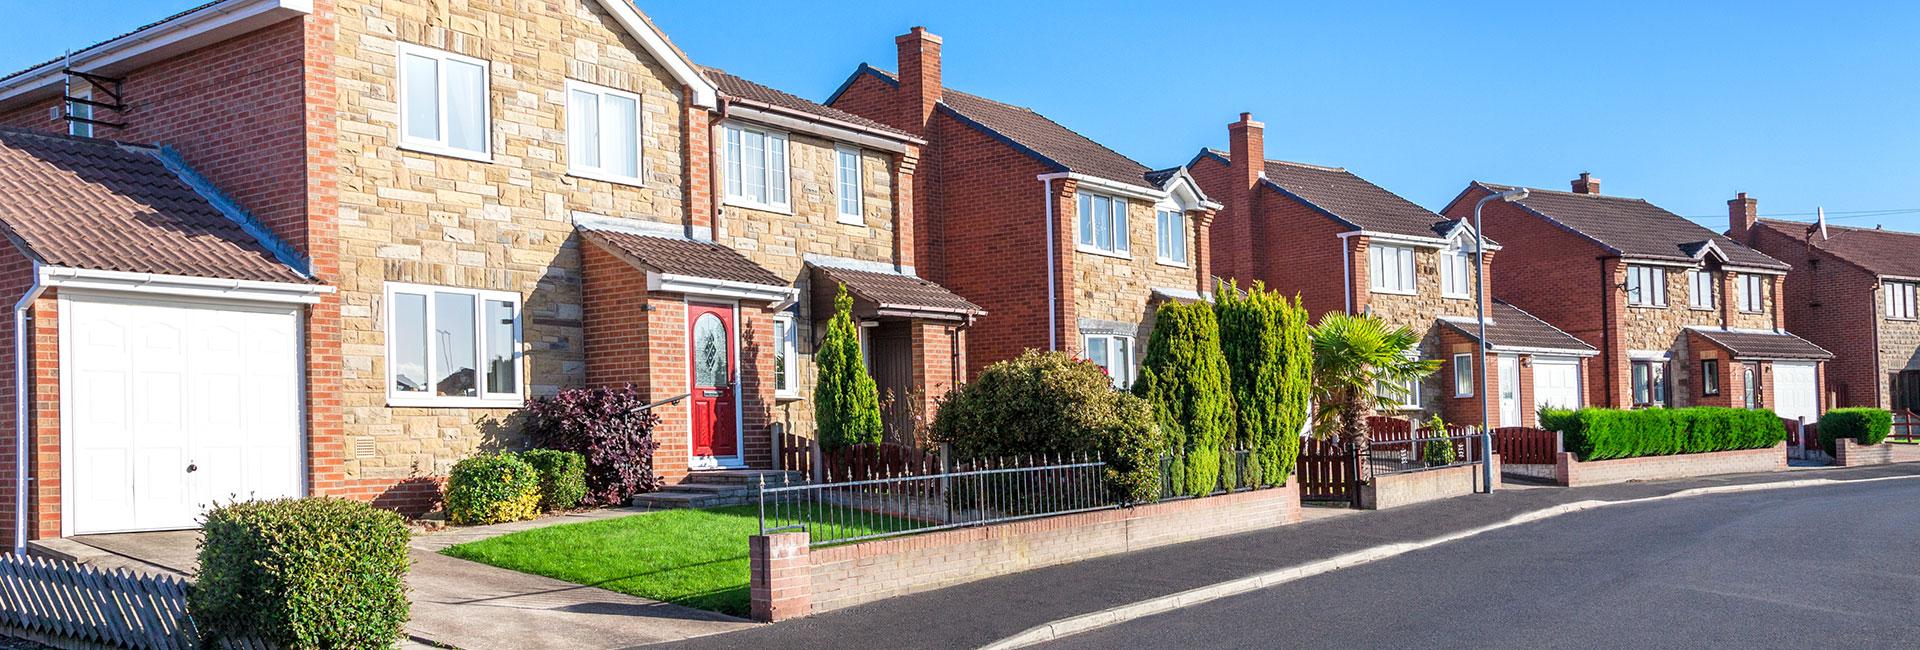 UK property market activity report - Property Activity Index